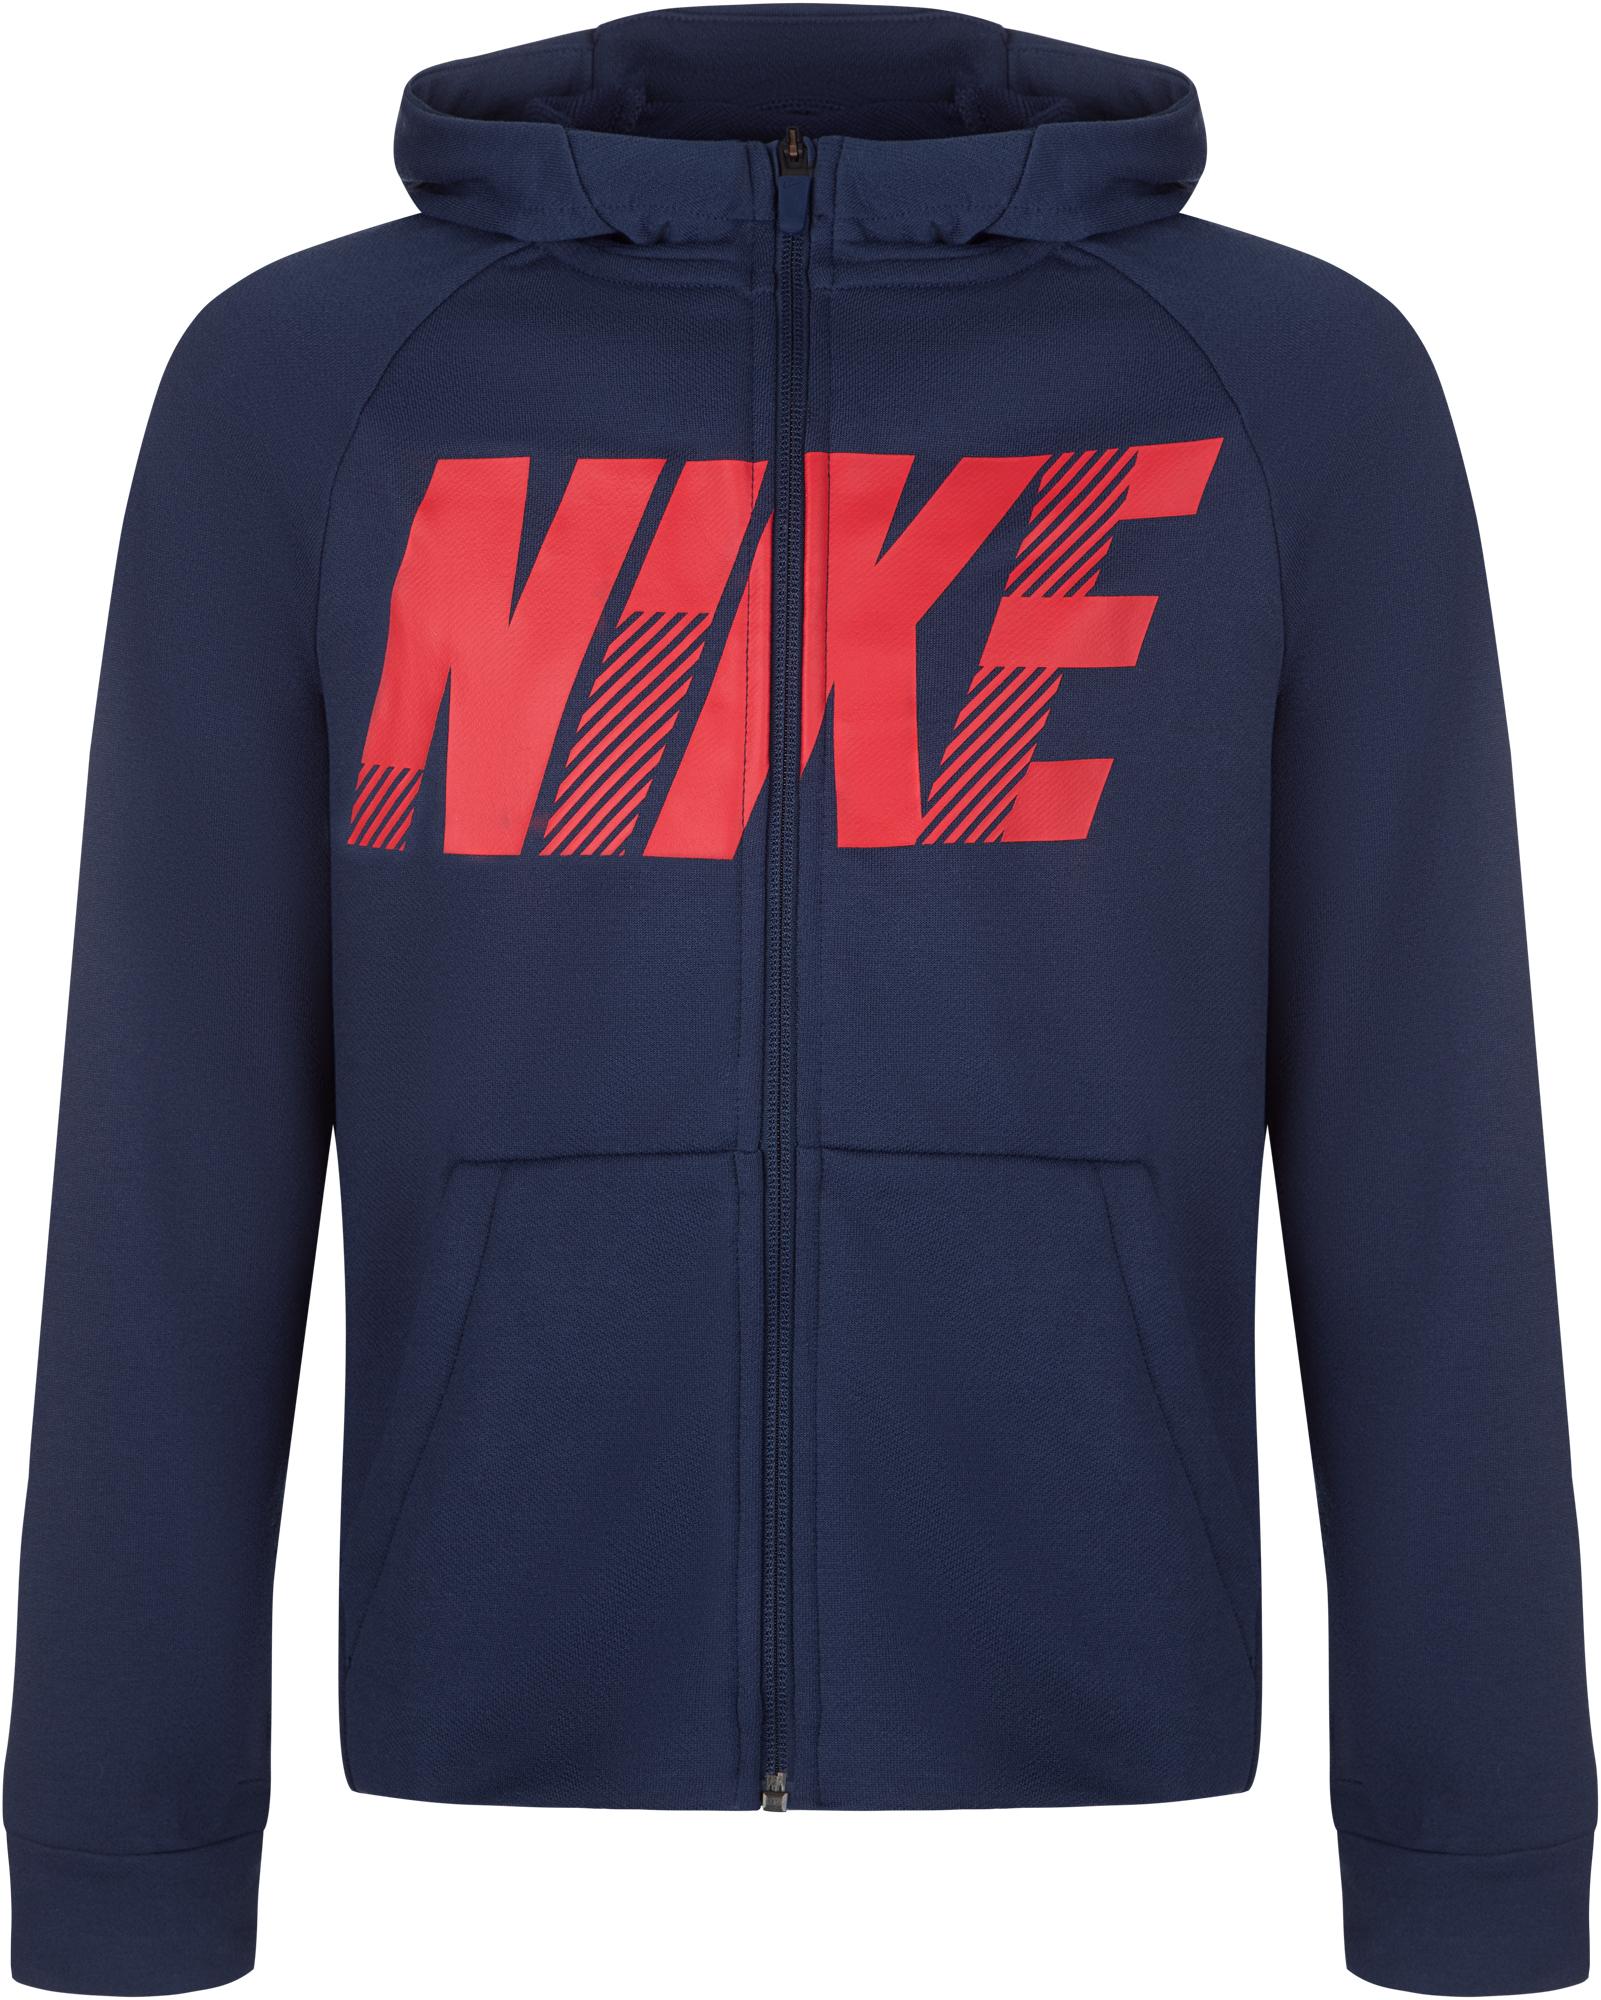 цена Nike Толстовка для мальчиков Nike Dry, размер 158-170 онлайн в 2017 году